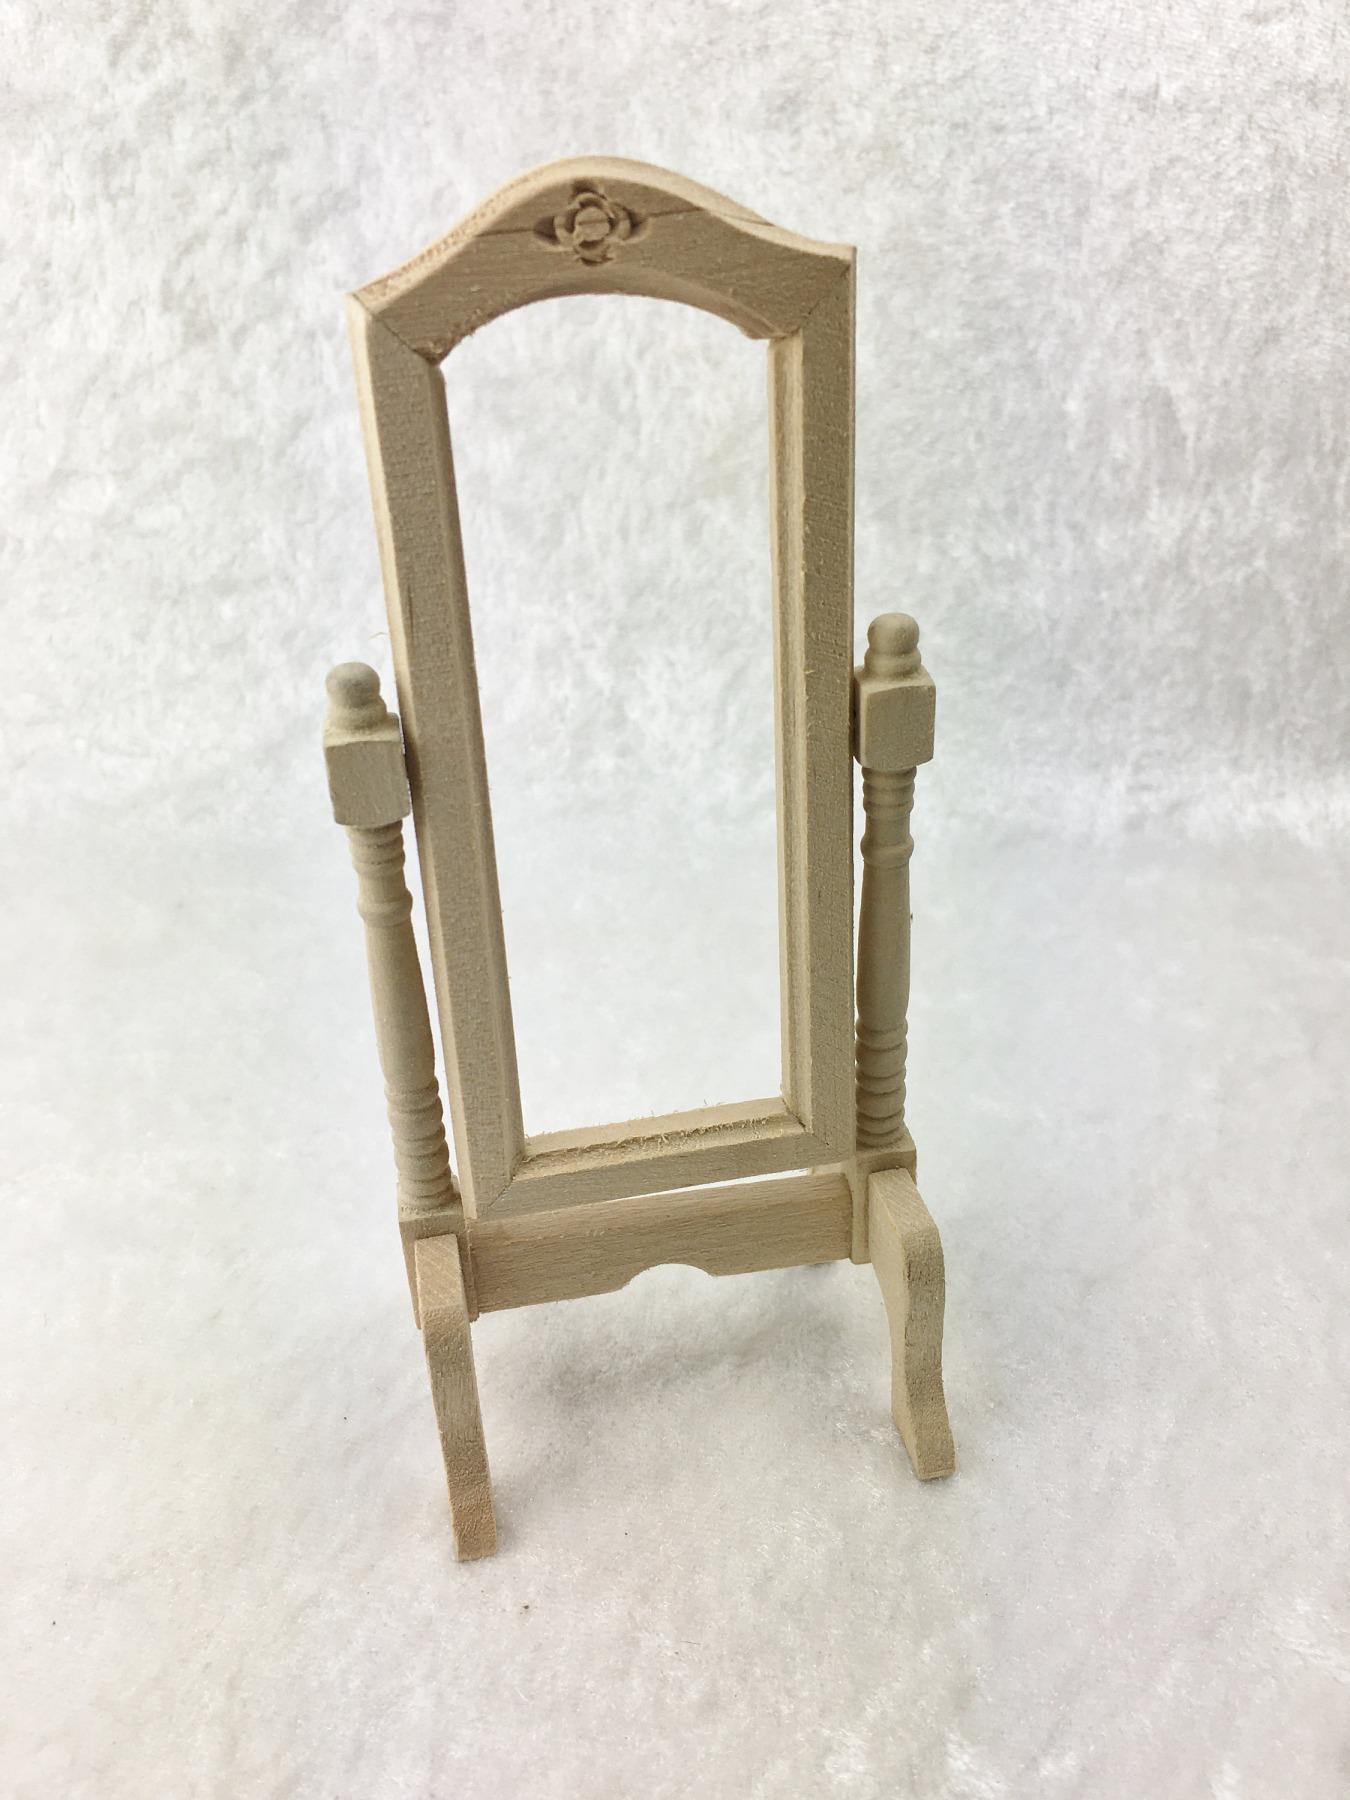 Standspiegel 1:12 Miniatur 7